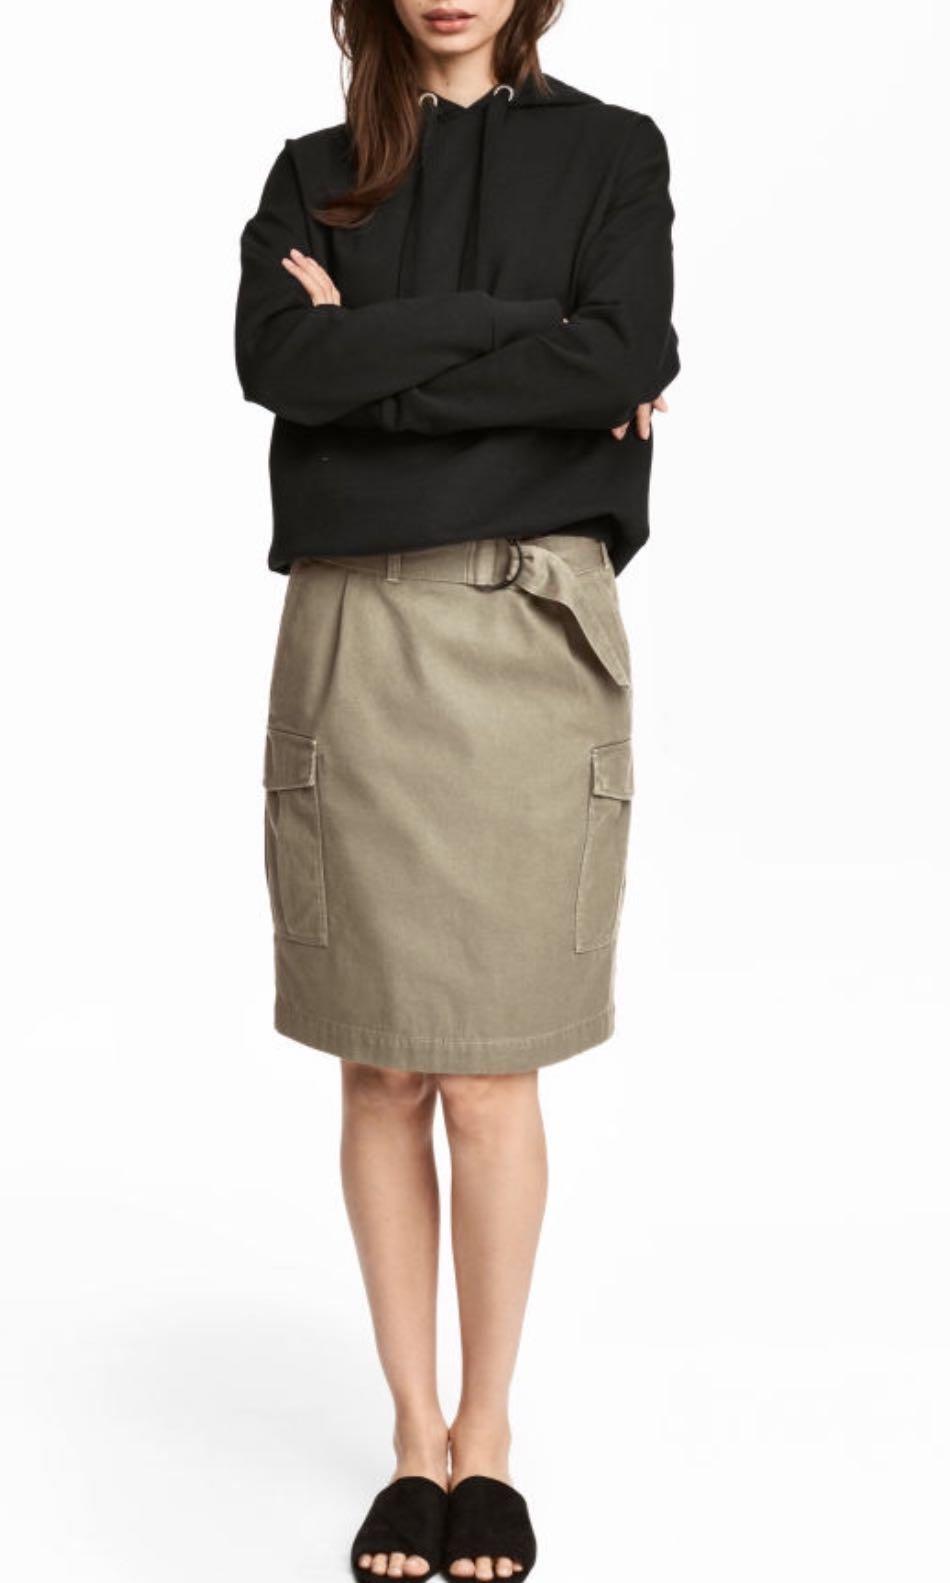 2d2942a8843 Home · Women s Fashion · Clothes · Dresses   Skirts. photo photo ...